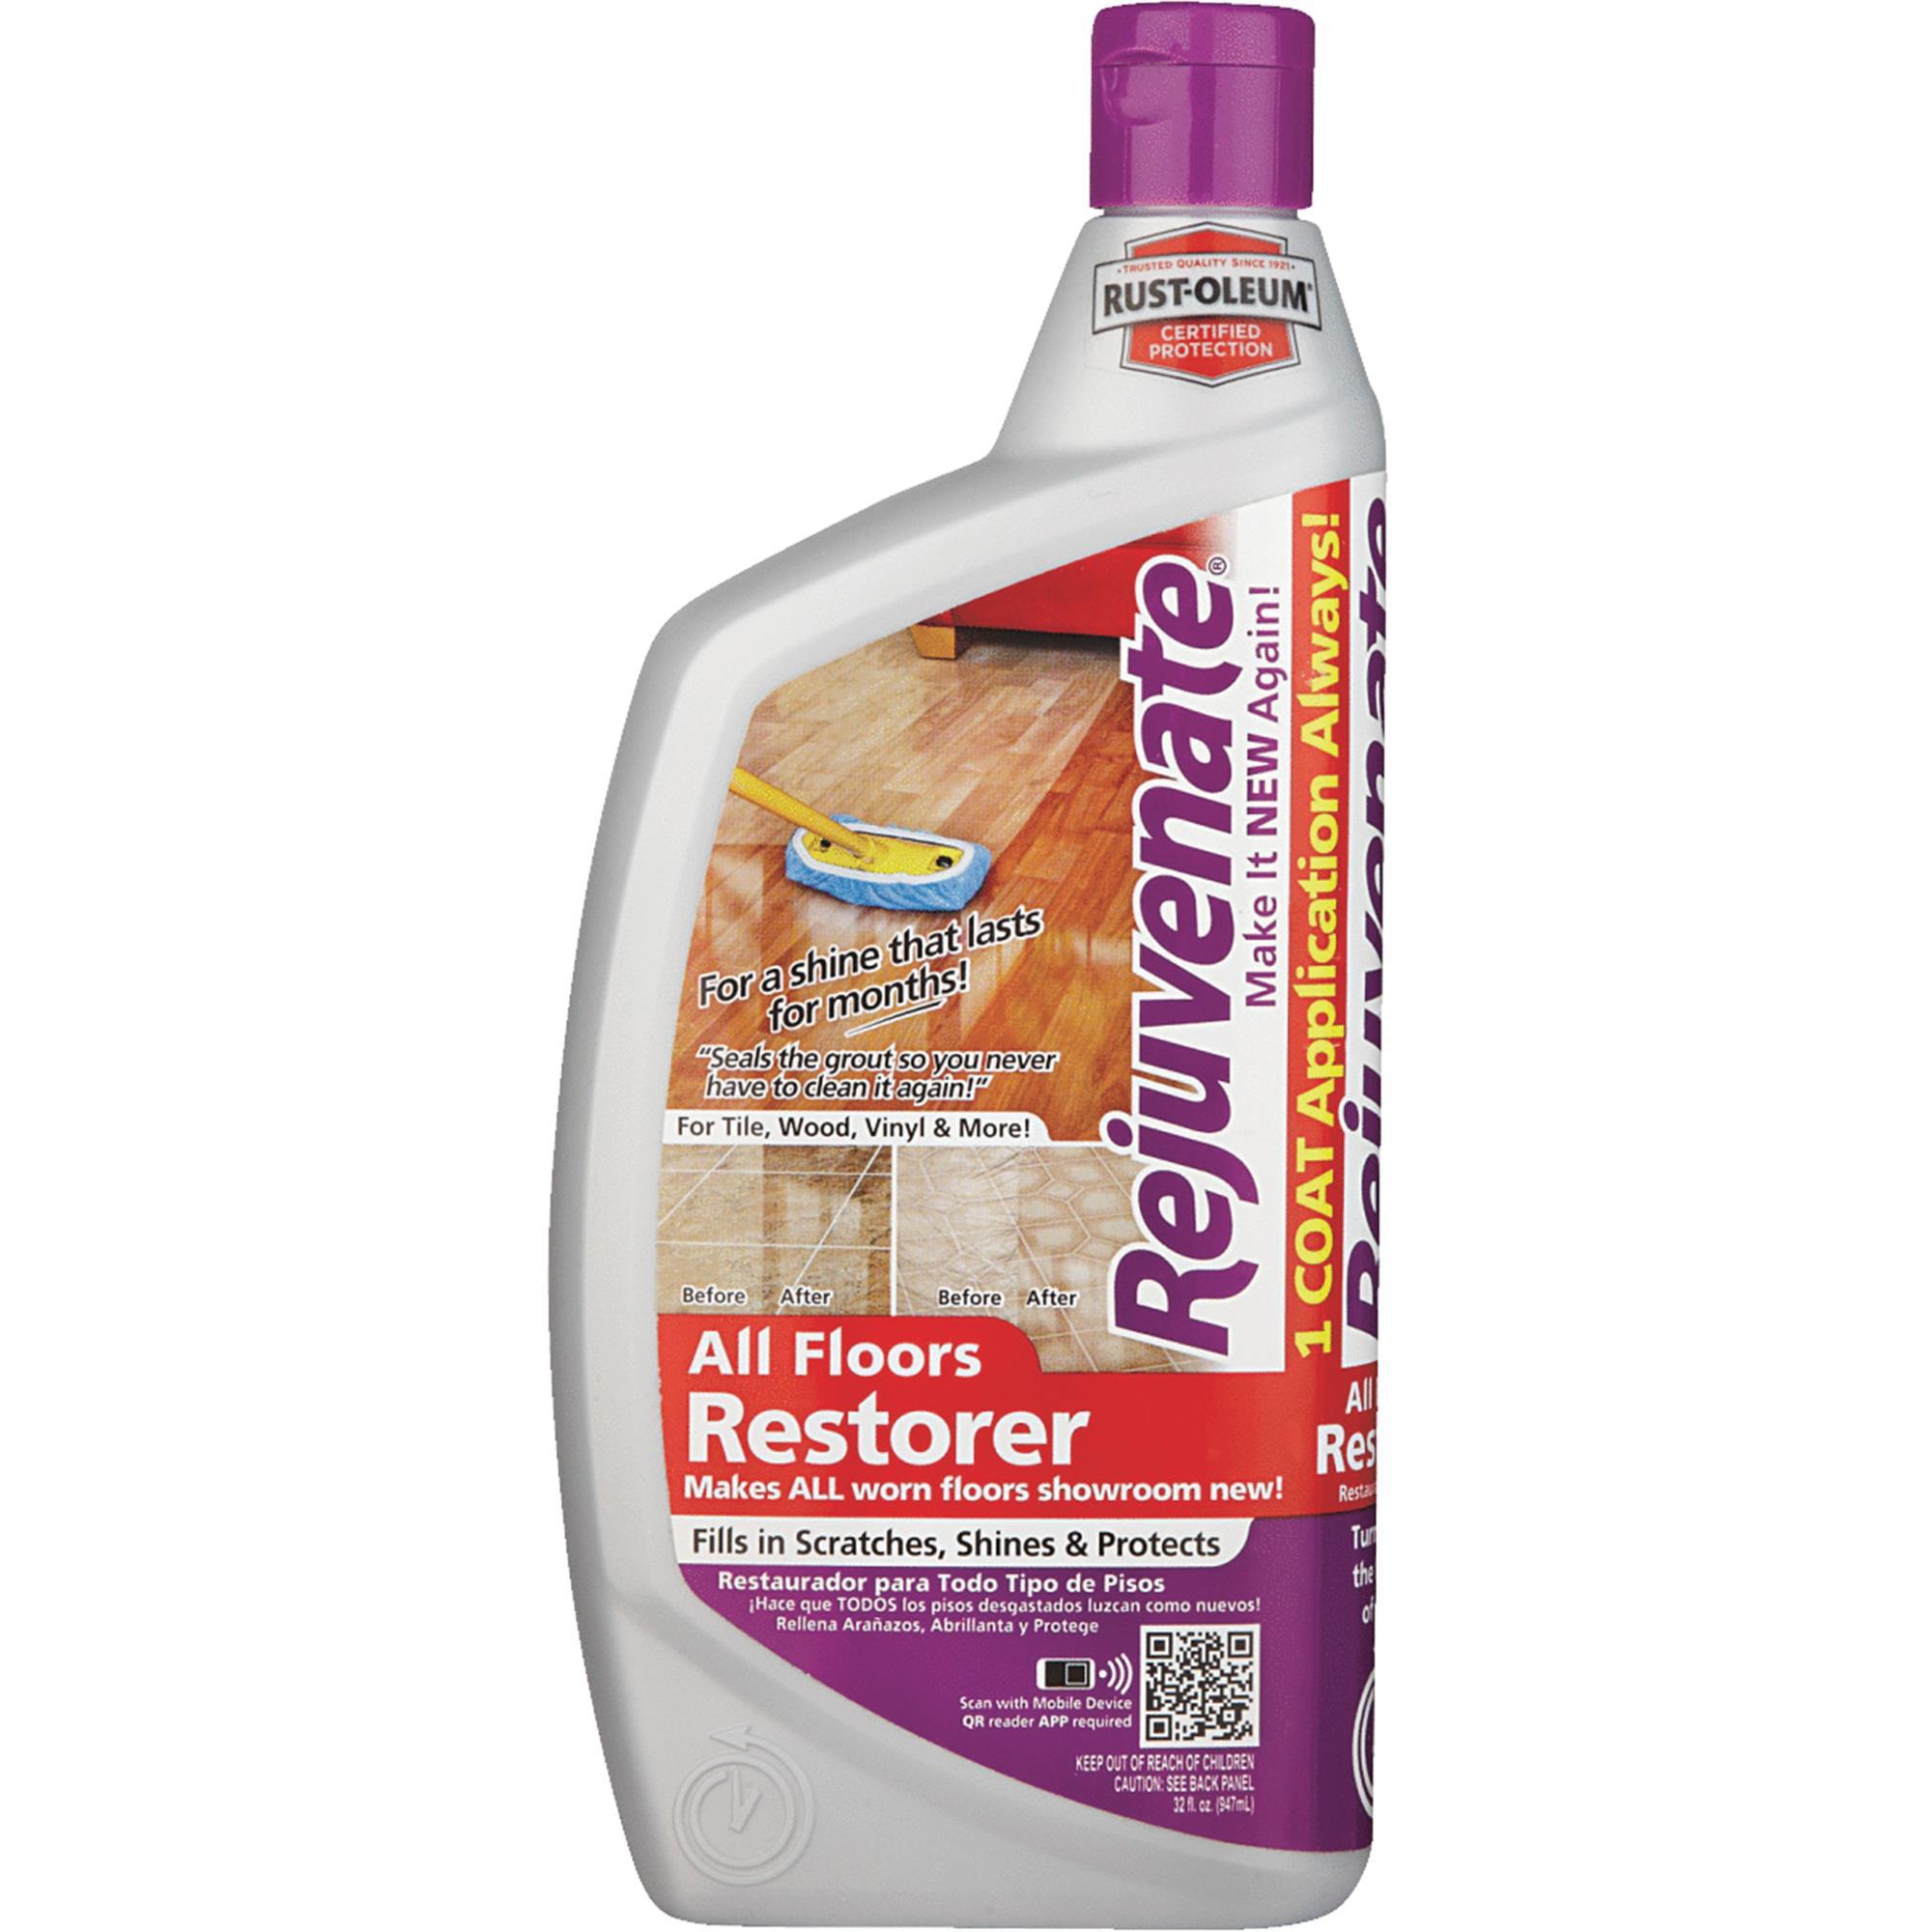 Rejuvenate grout cleaner reviews amazing large size of rejuvenate cheap rejuvenate grout cleaner reviews with rejuvenate grout cleaner reviews doublecrazyfo Images